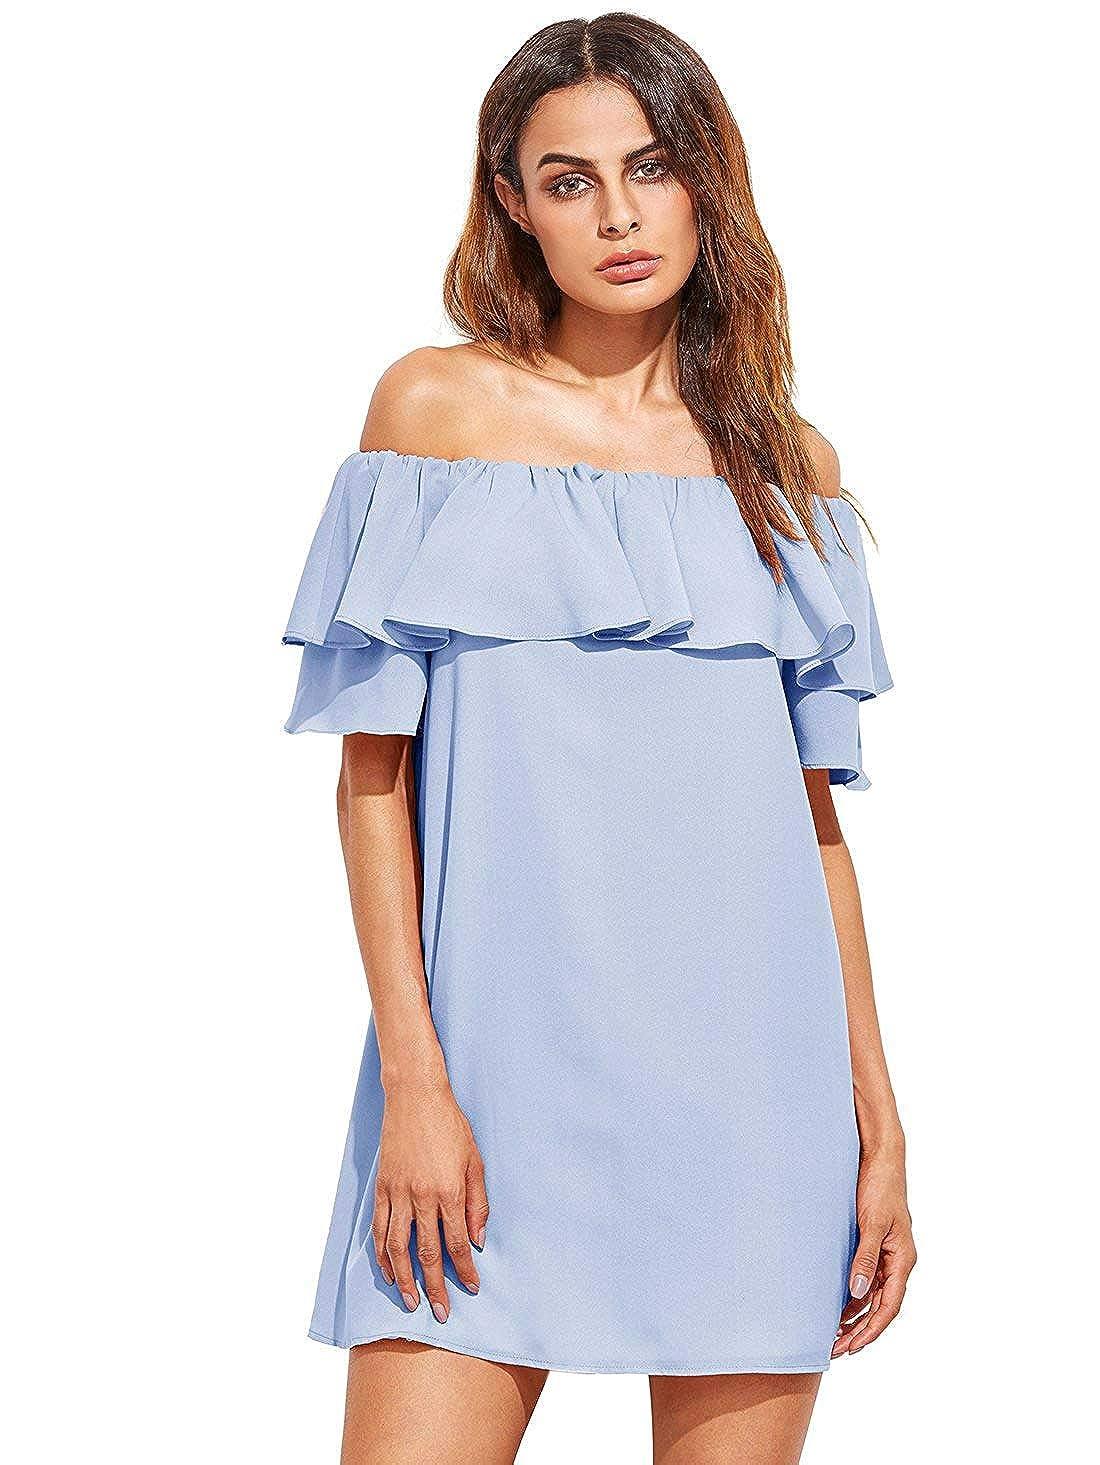 b29b28f6e4 Milumia Women's Off Shoulder Ruffles Shift Loose Mini Dress at Amazon  Women's Clothing store: